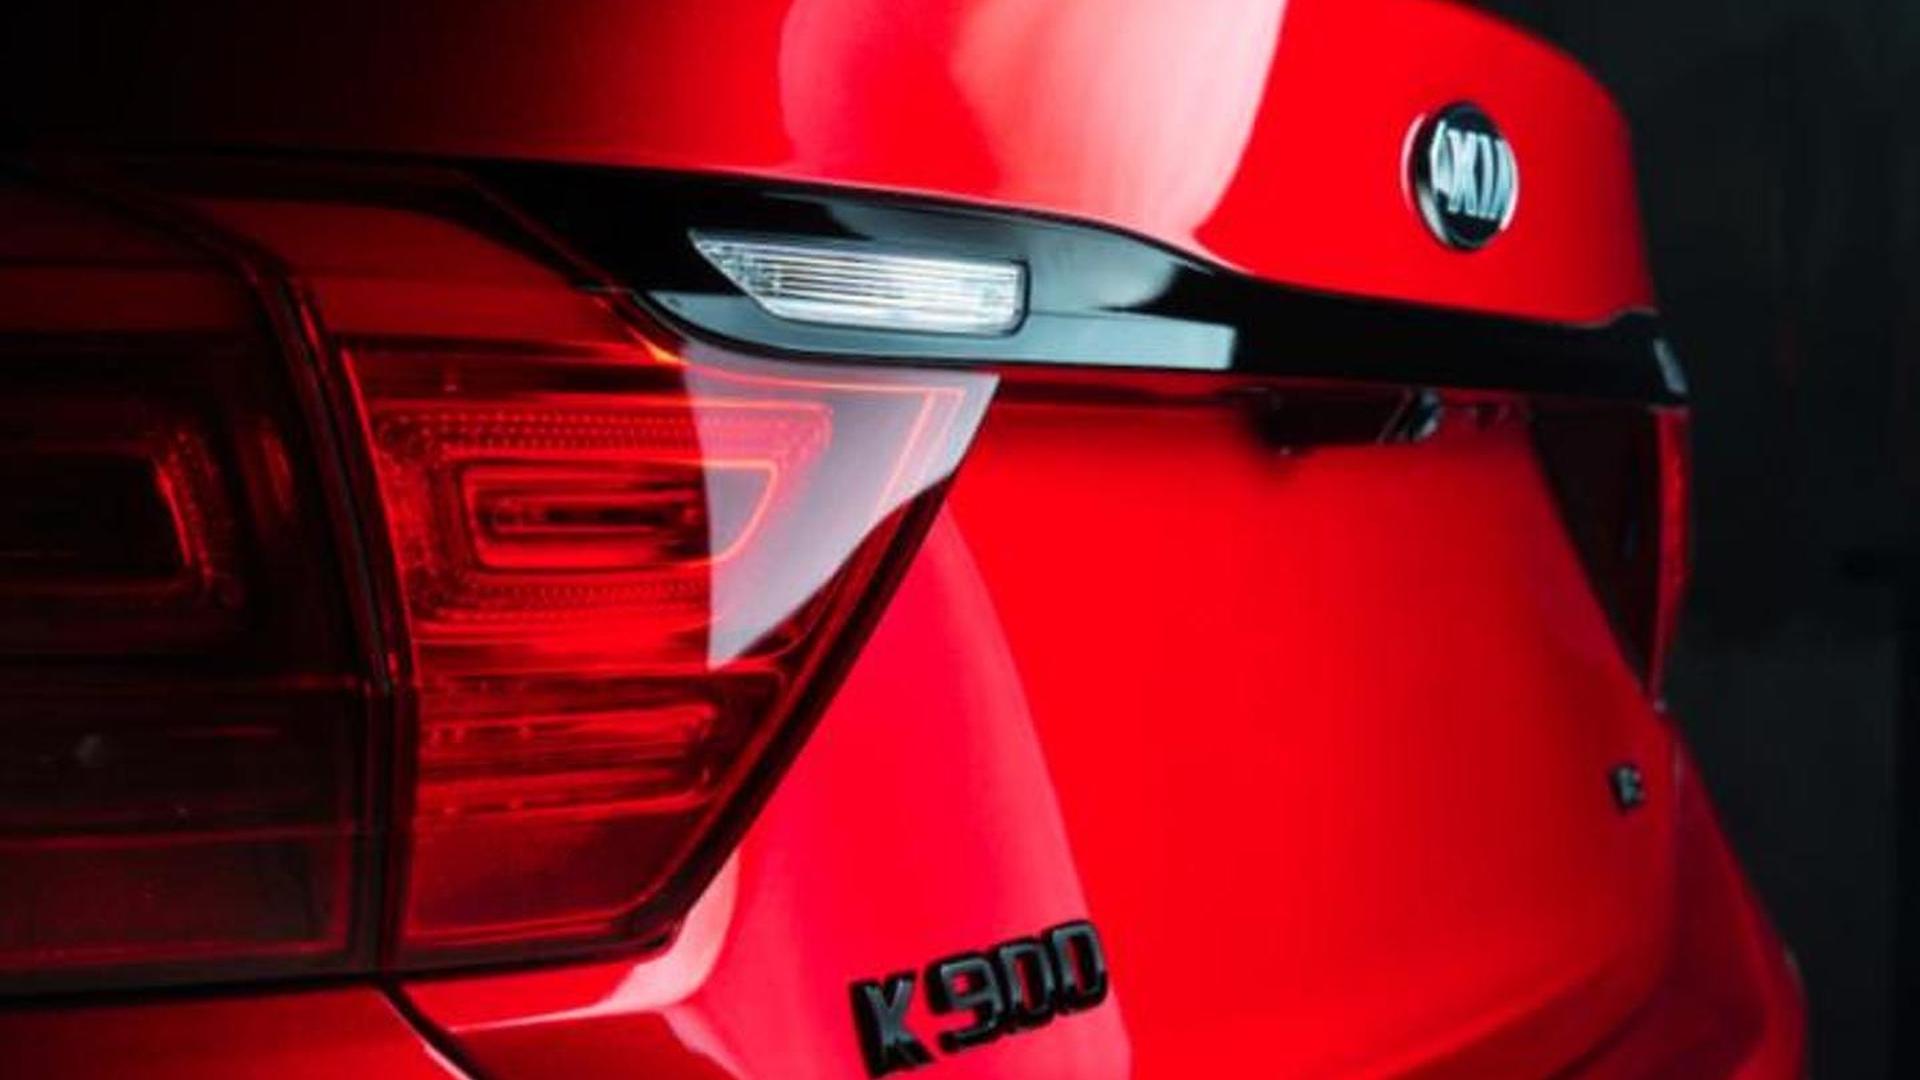 kia k900 2015 red. kia k900 2015 red